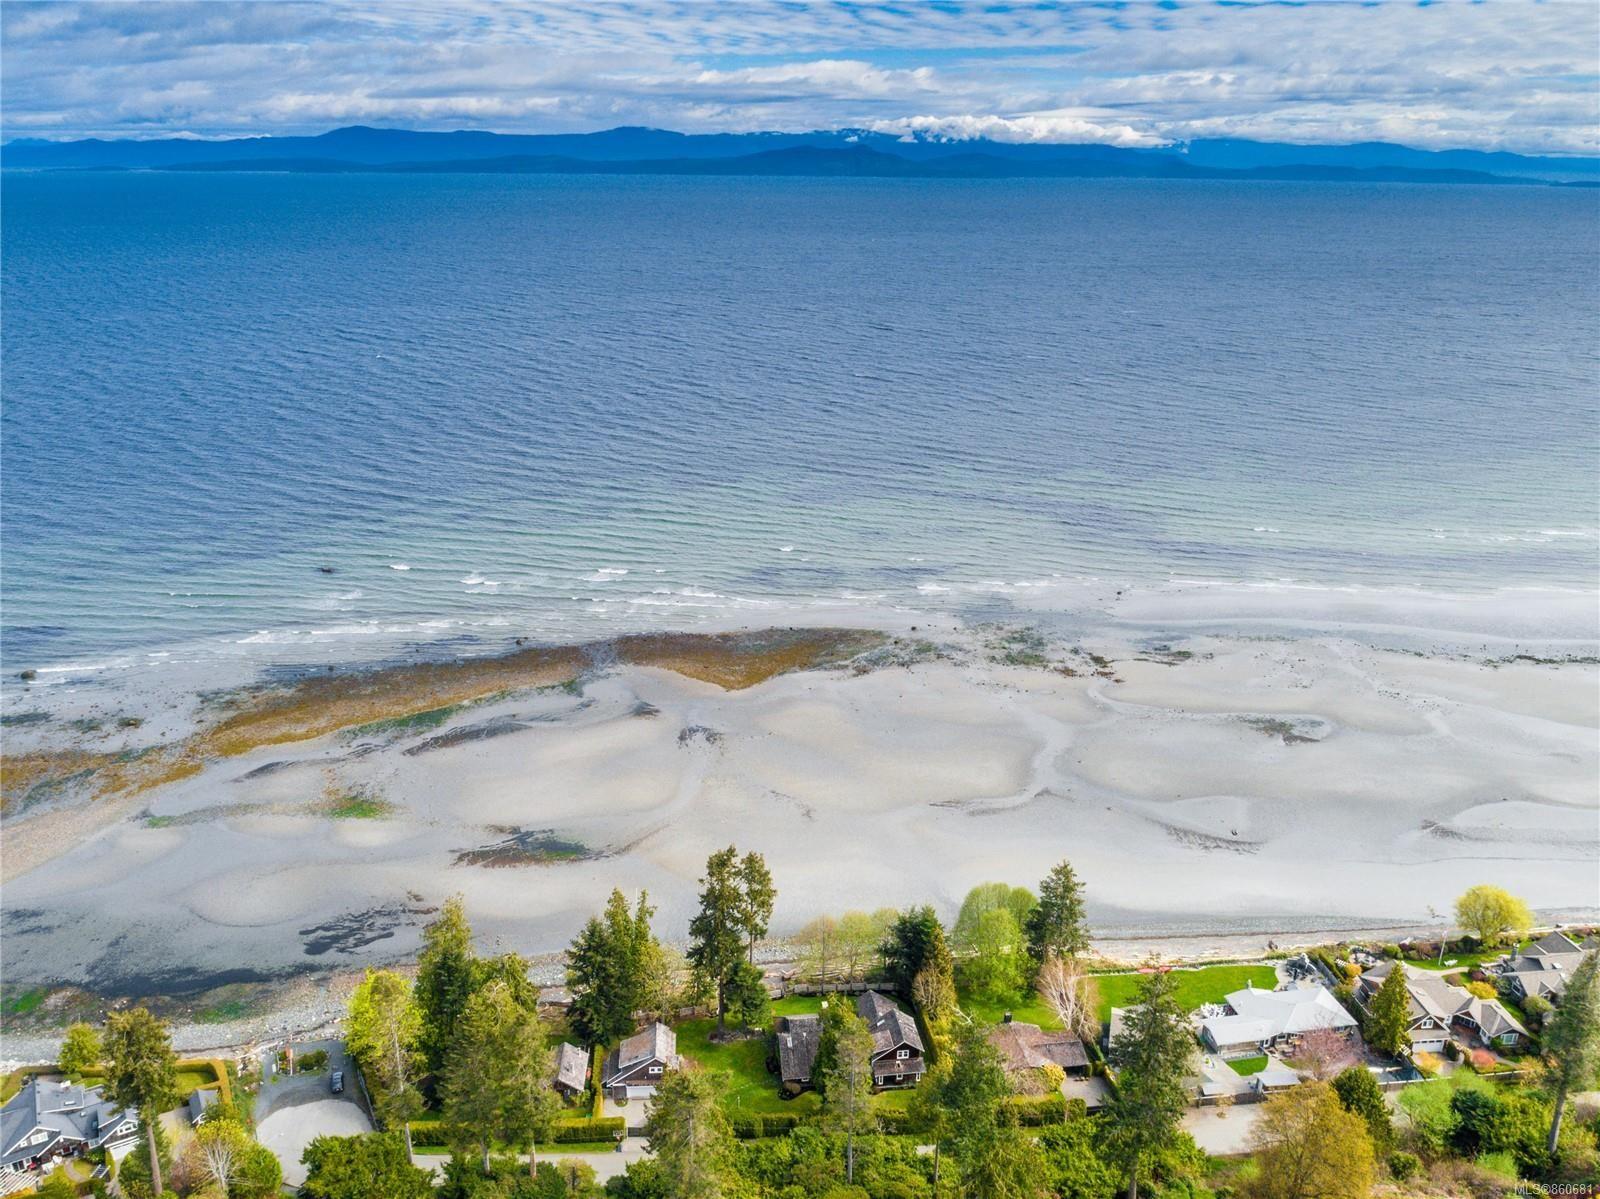 Main Photo: 969 Seacrest Pl in : PQ Qualicum Beach House for sale (Parksville/Qualicum)  : MLS®# 860681